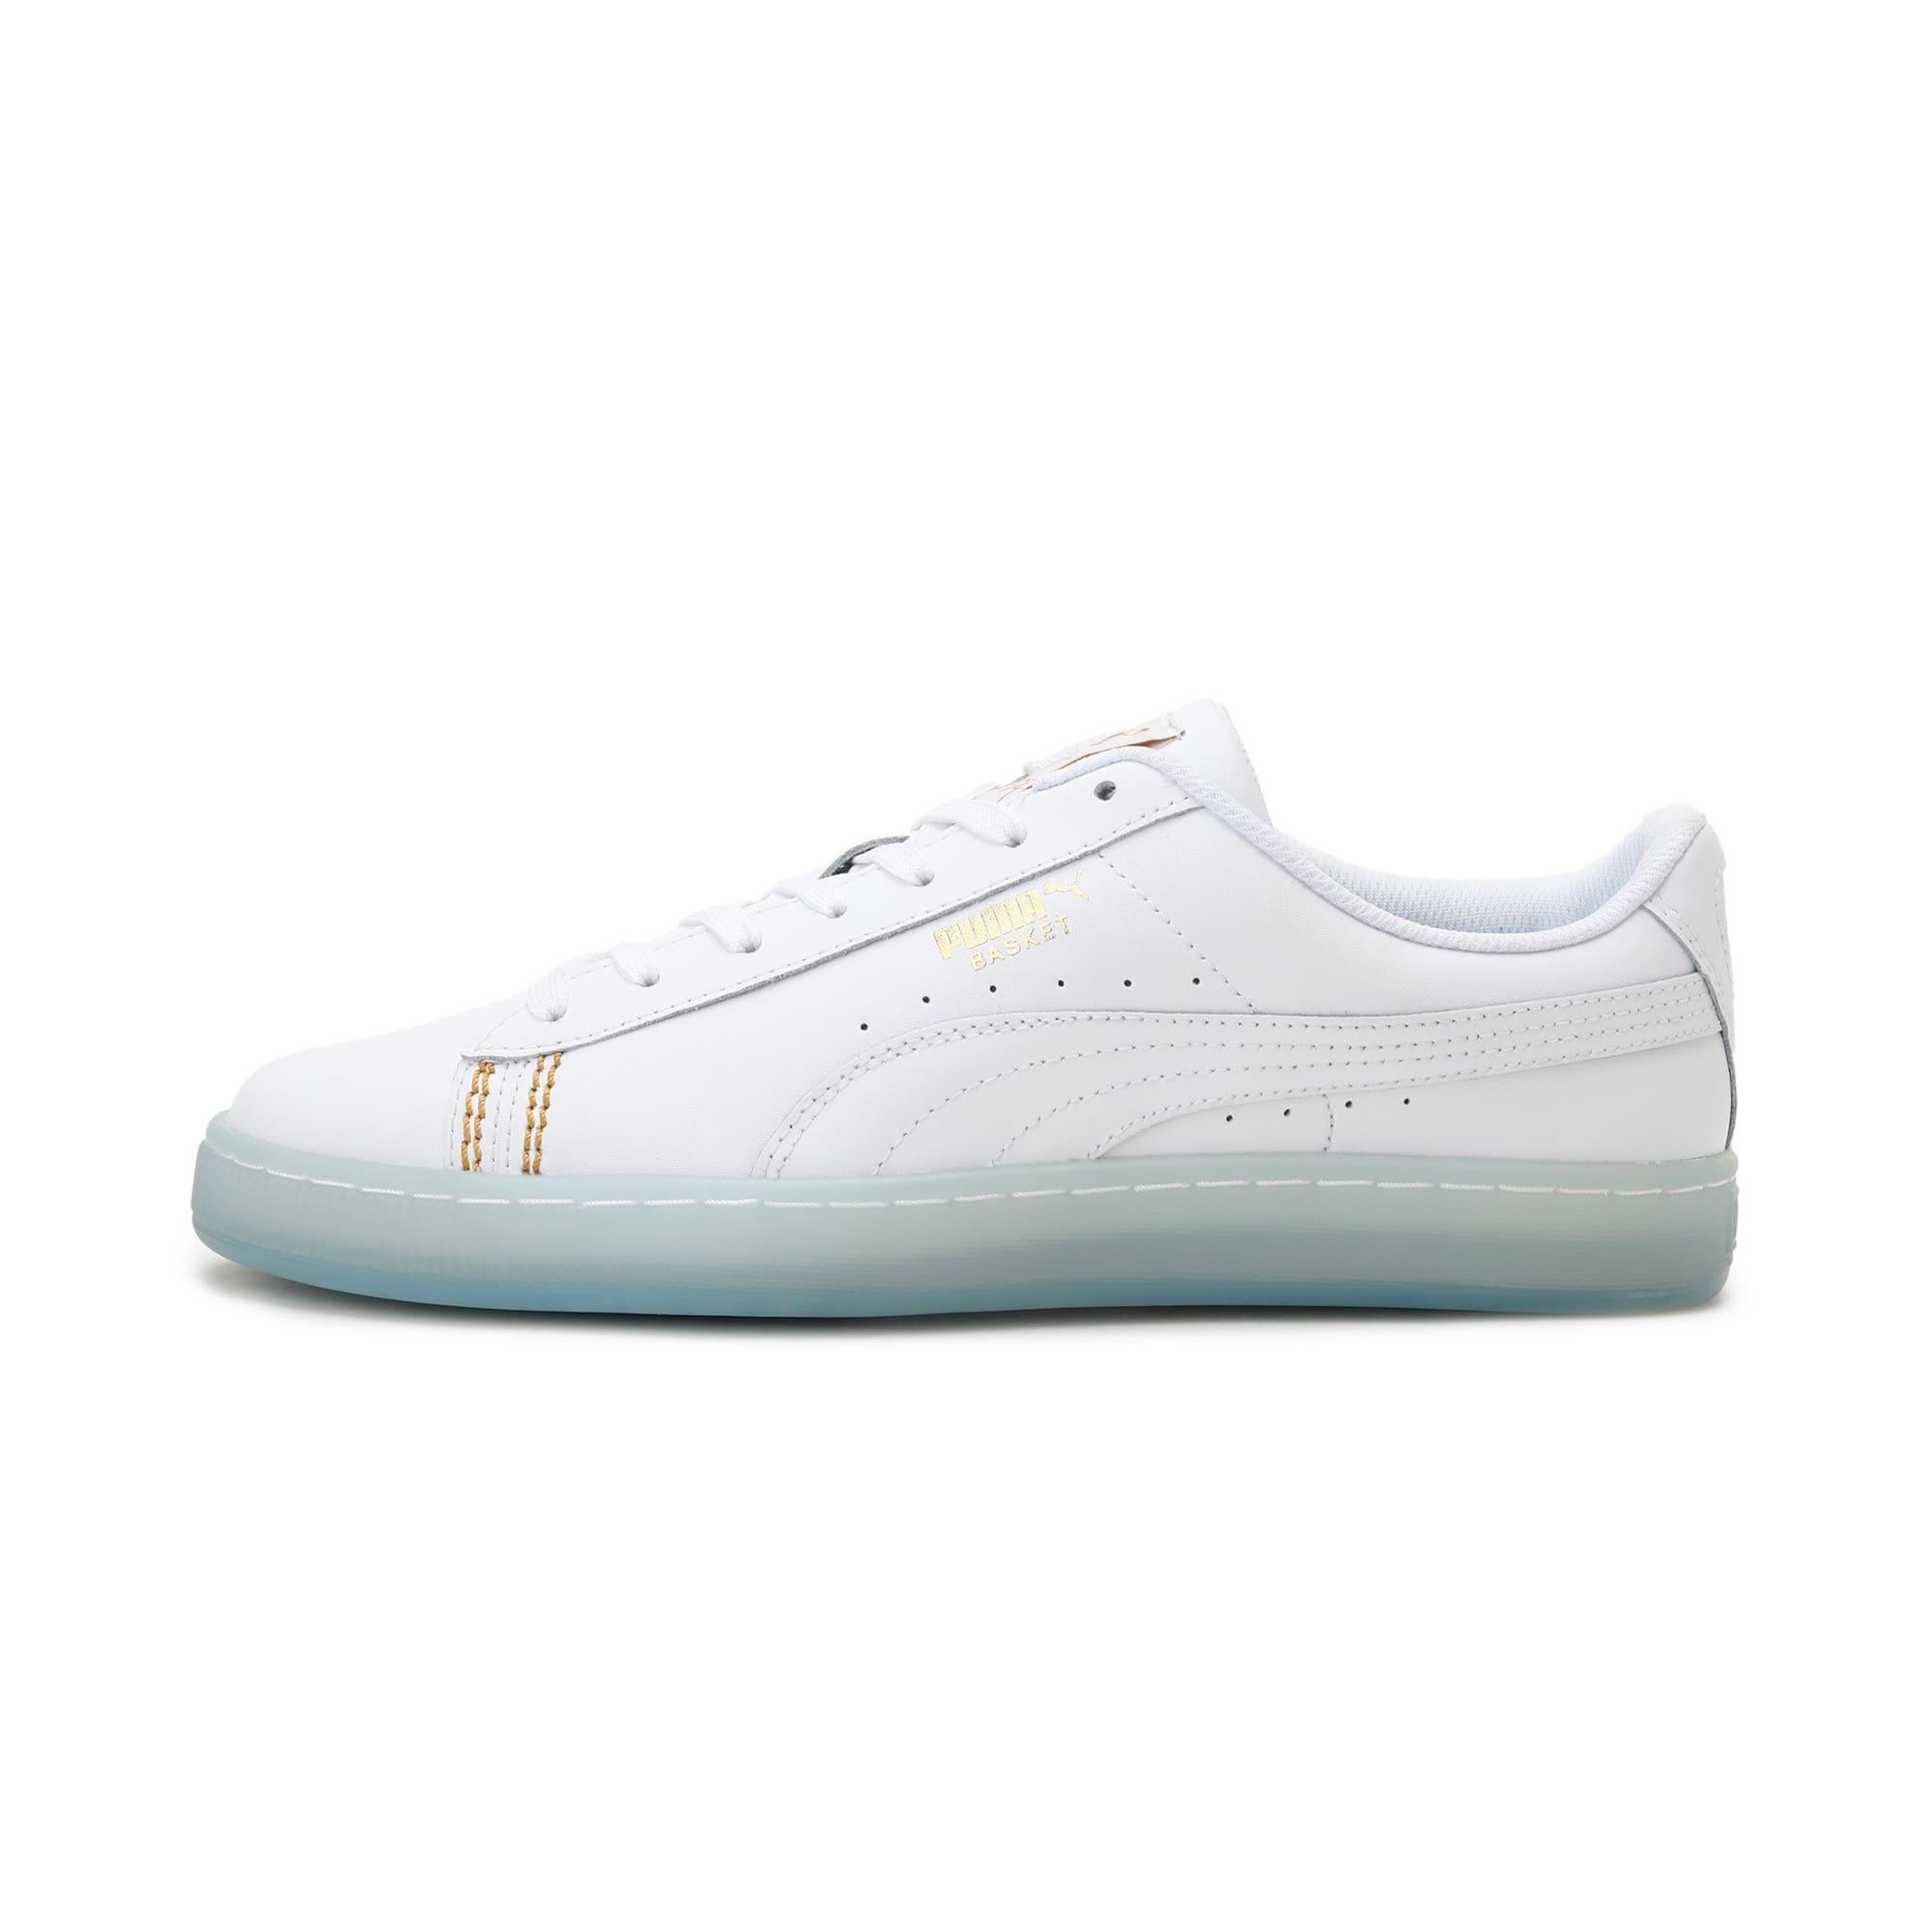 Thumbnail 1 of Basket Classic one8 Unisex Sneakers, White-Team Gold-Bleu Azur, medium-IND